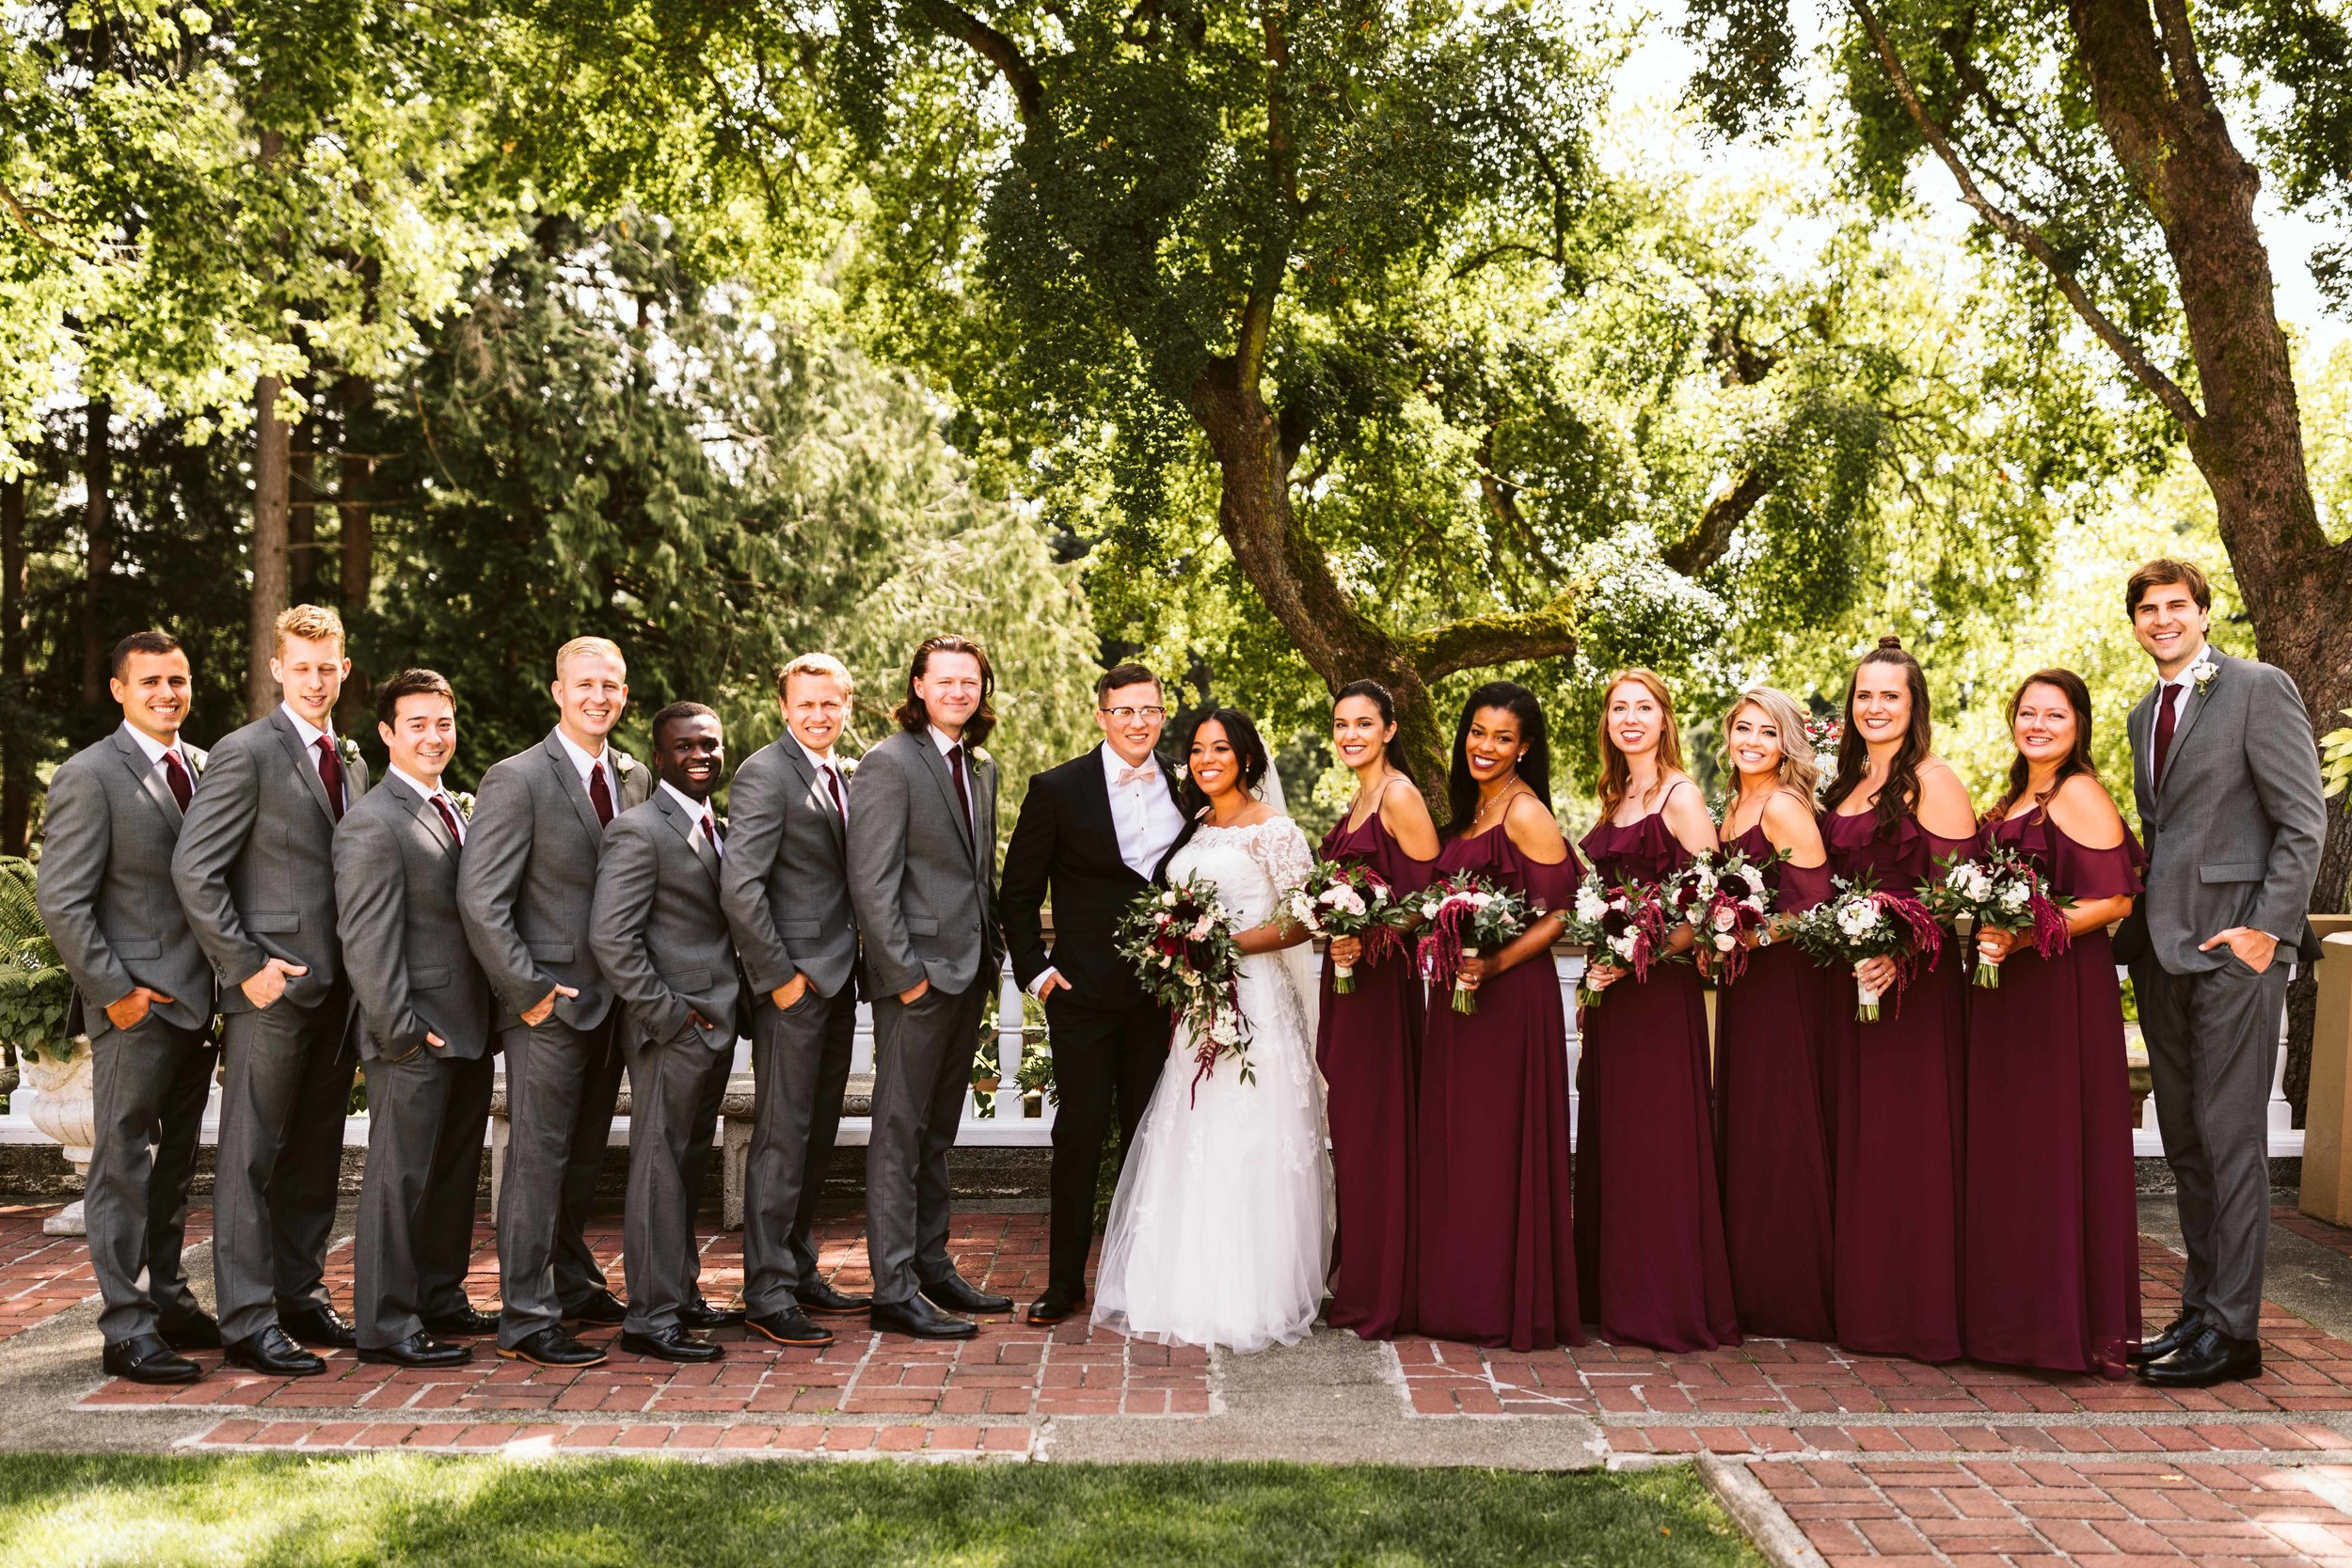 lairmont-manor-wedding-41.jpg